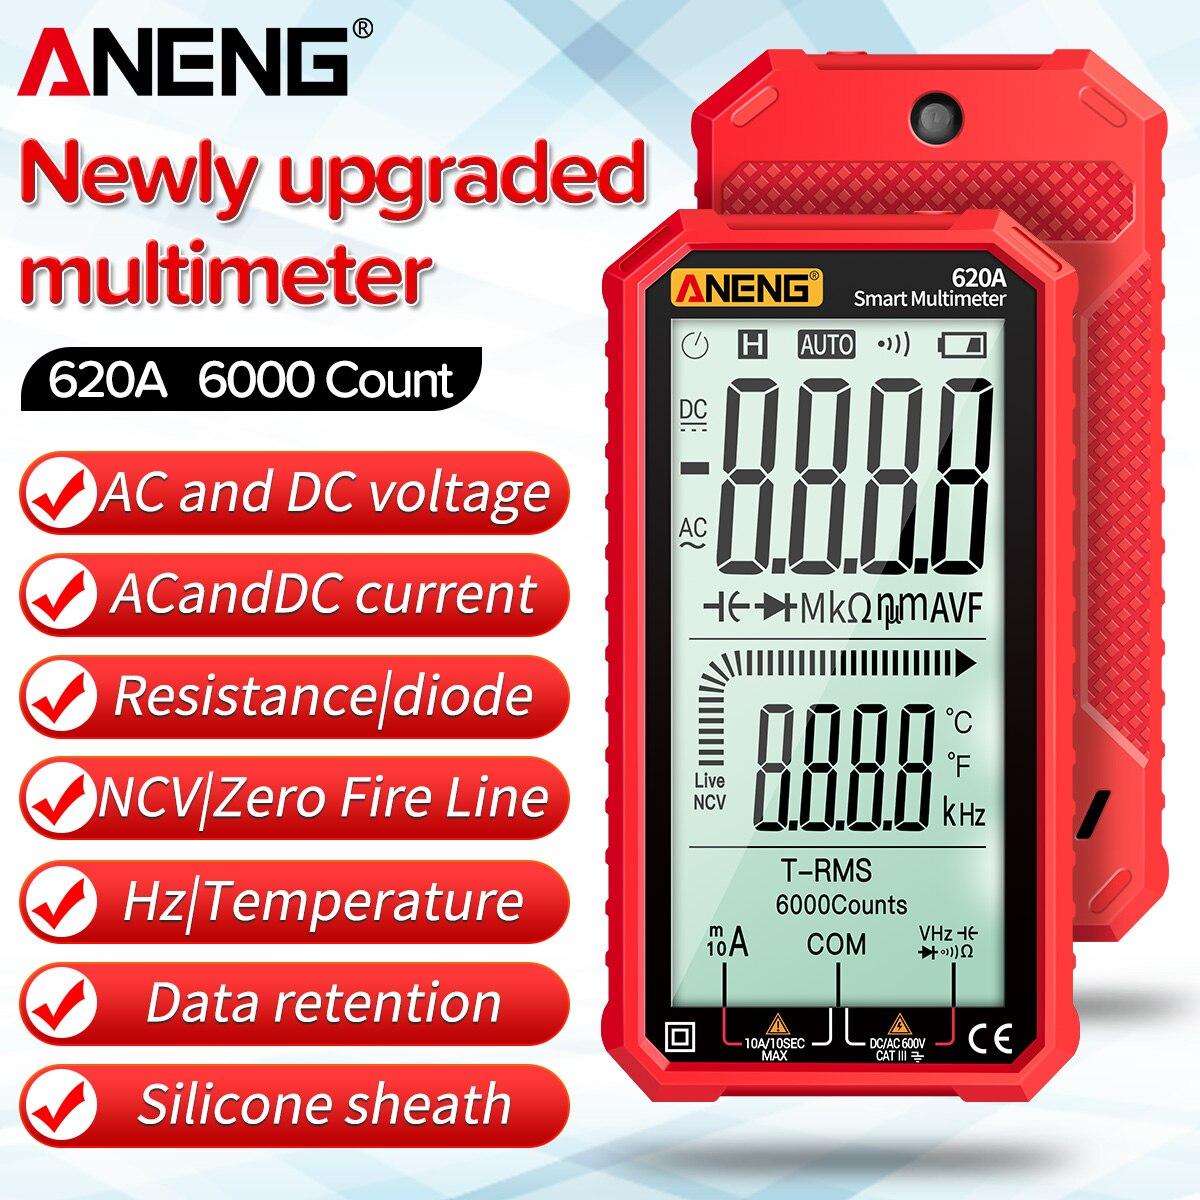 ANENG 4.7 بوصة شاشة الكريستال السائل التيار المتناوب/تيار مستمر الرقمية المتعدد Ultraportable True-RMS المتعدد السيارات متعددة اختبار